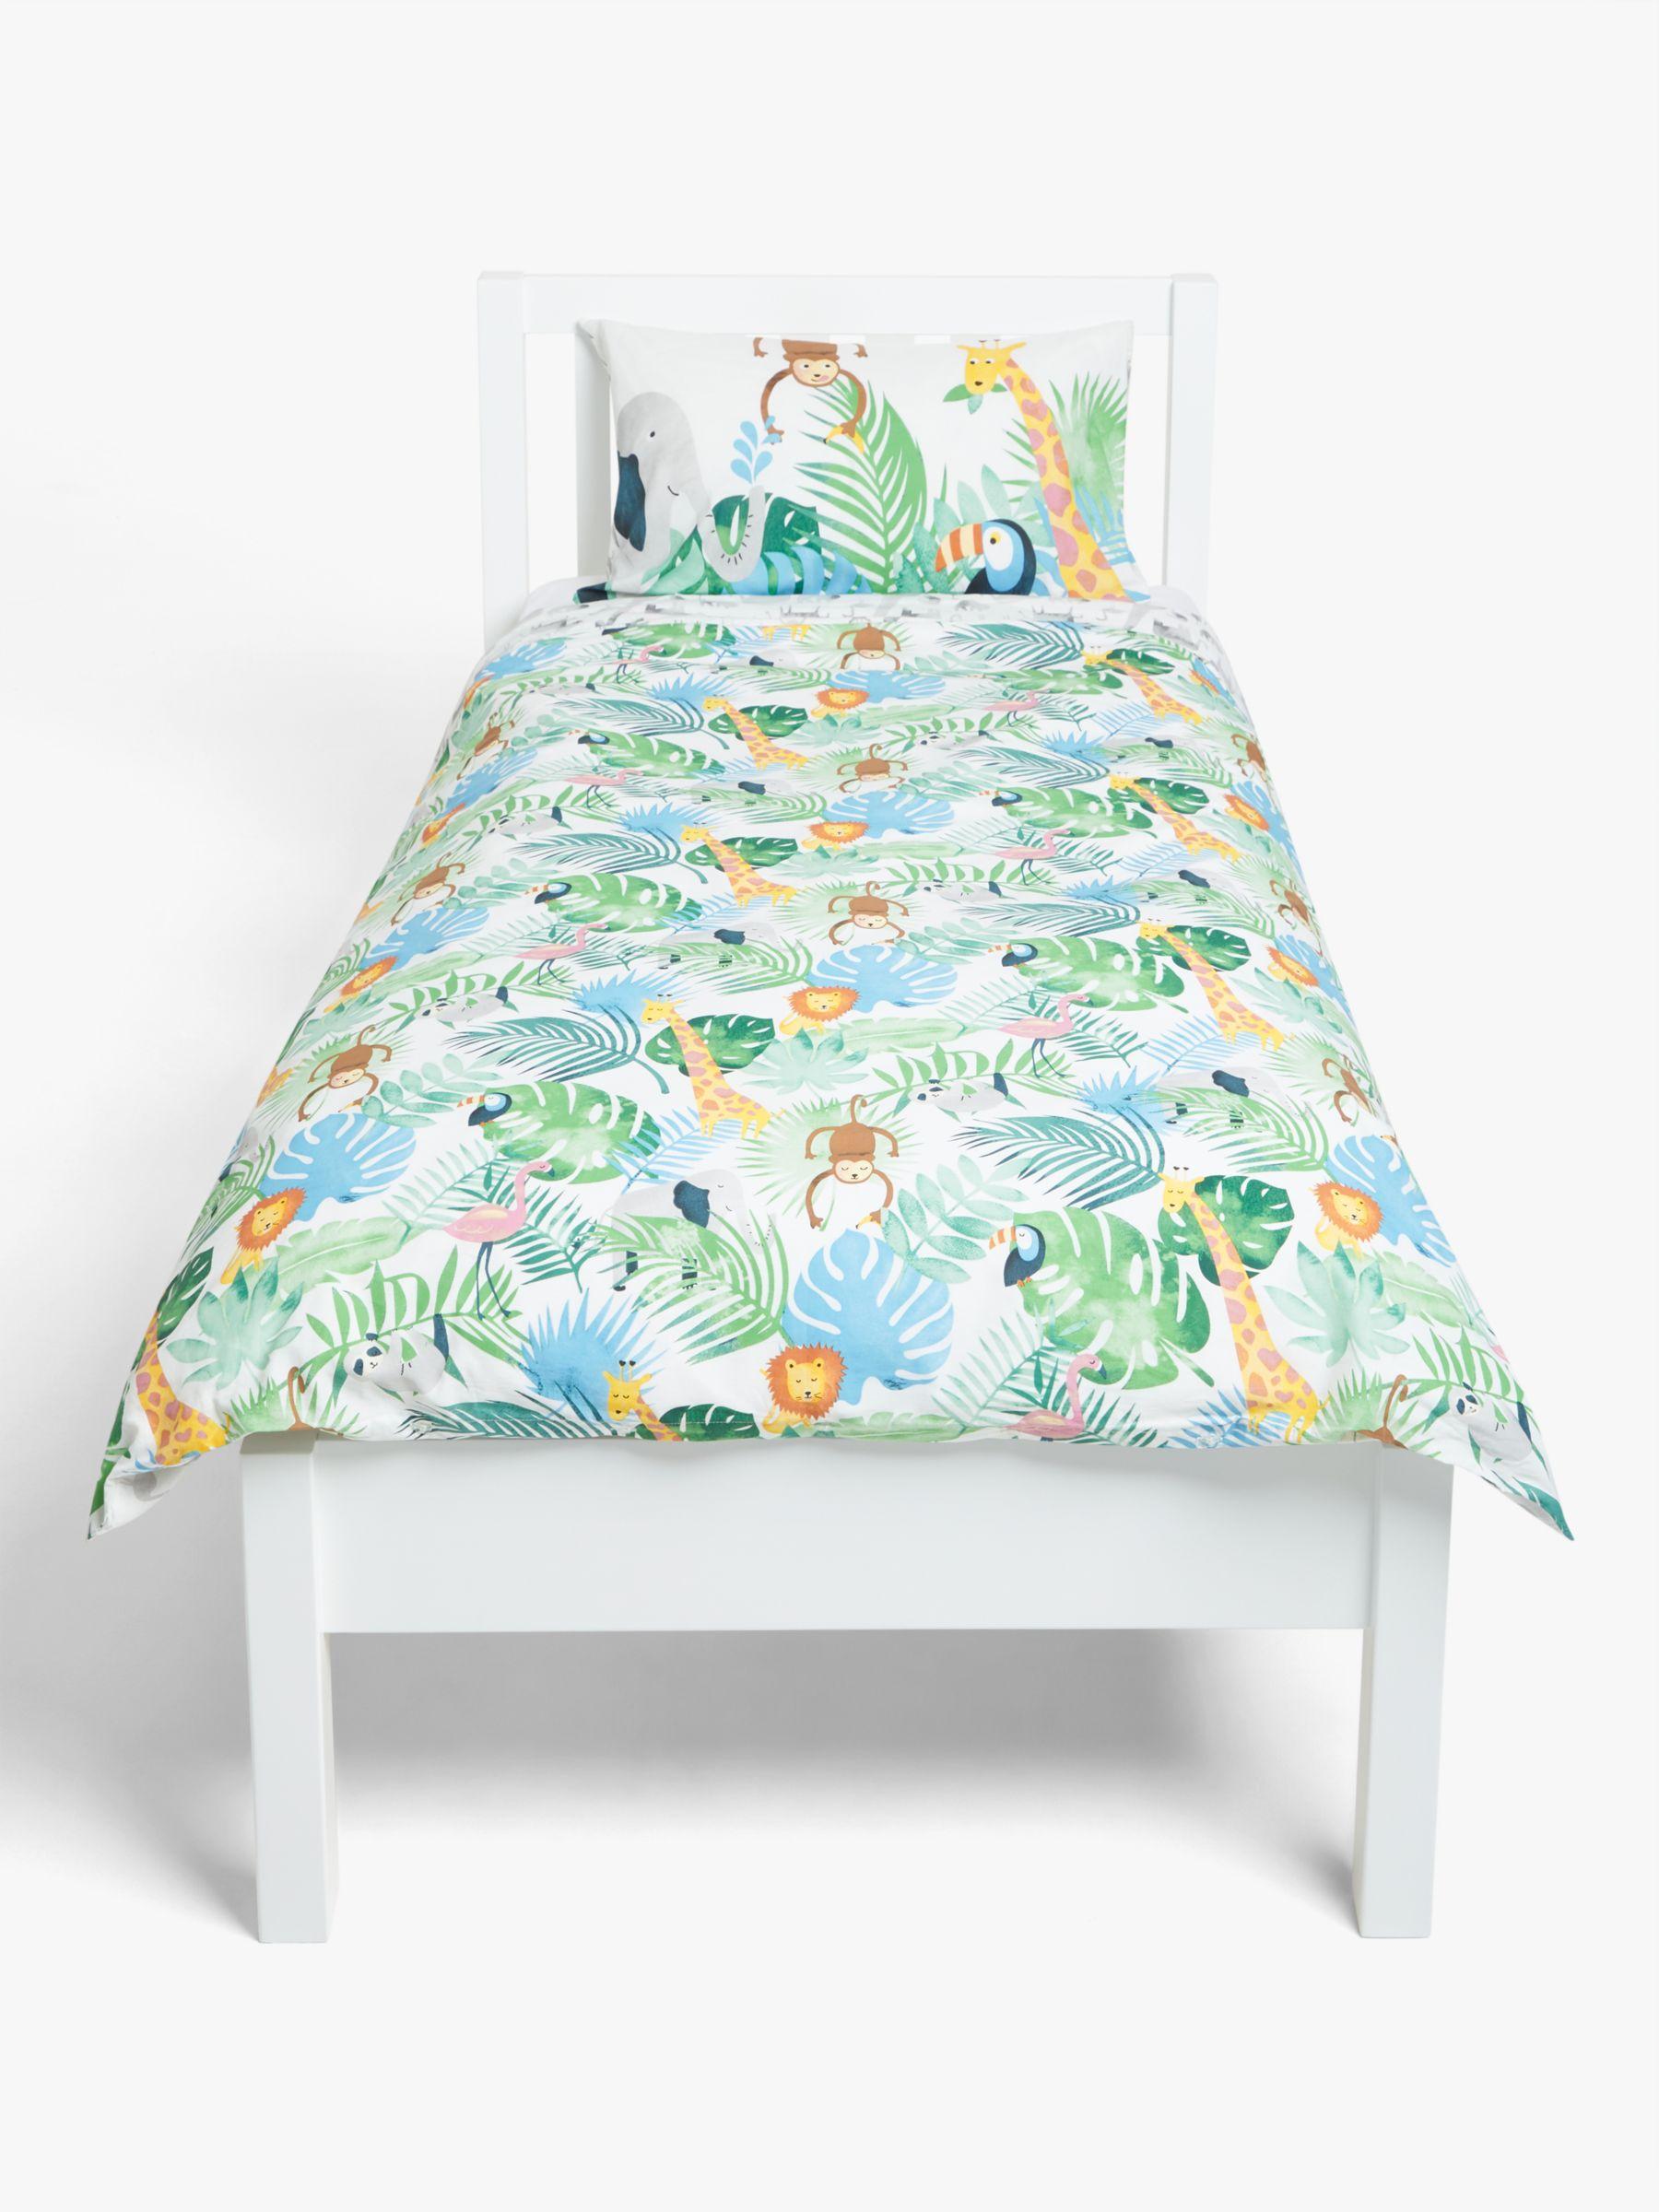 little home at John Lewis Safari & Friends Reversible Cotton Duvet Cover and Pillowcase Set, Single, Multi